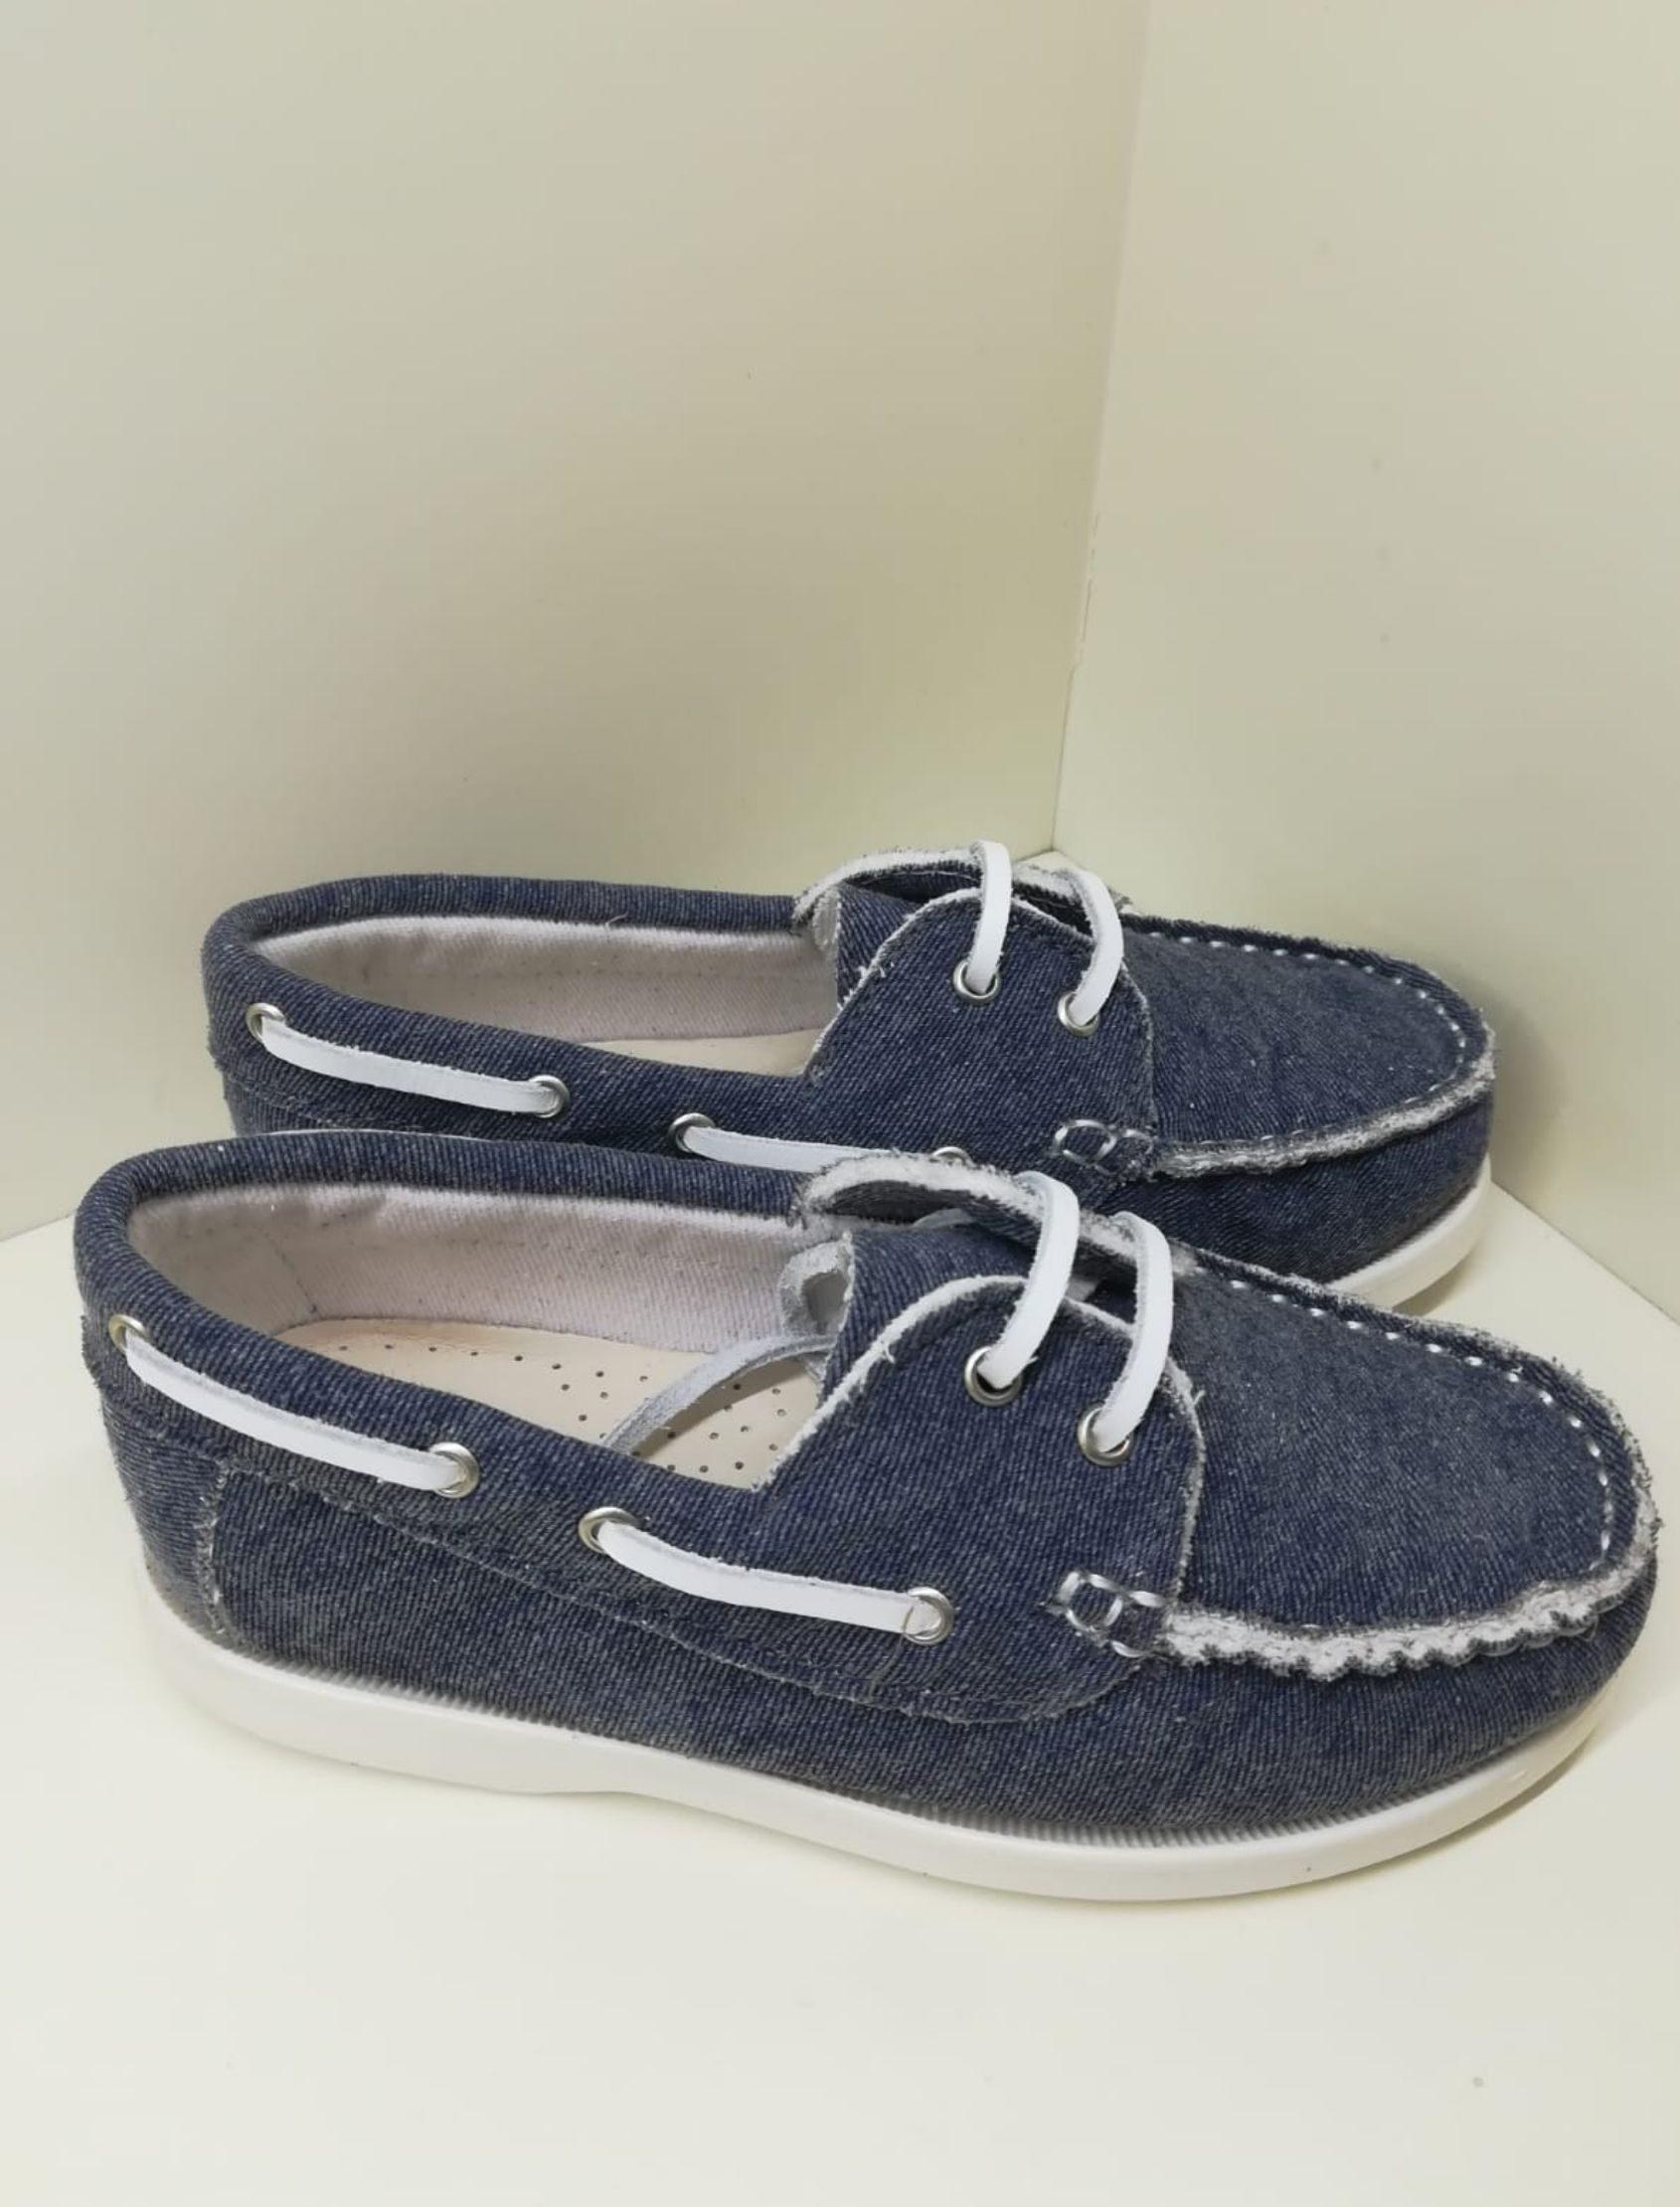 zapato de niño etilo náutico en coloz azul marino con cordón blanco